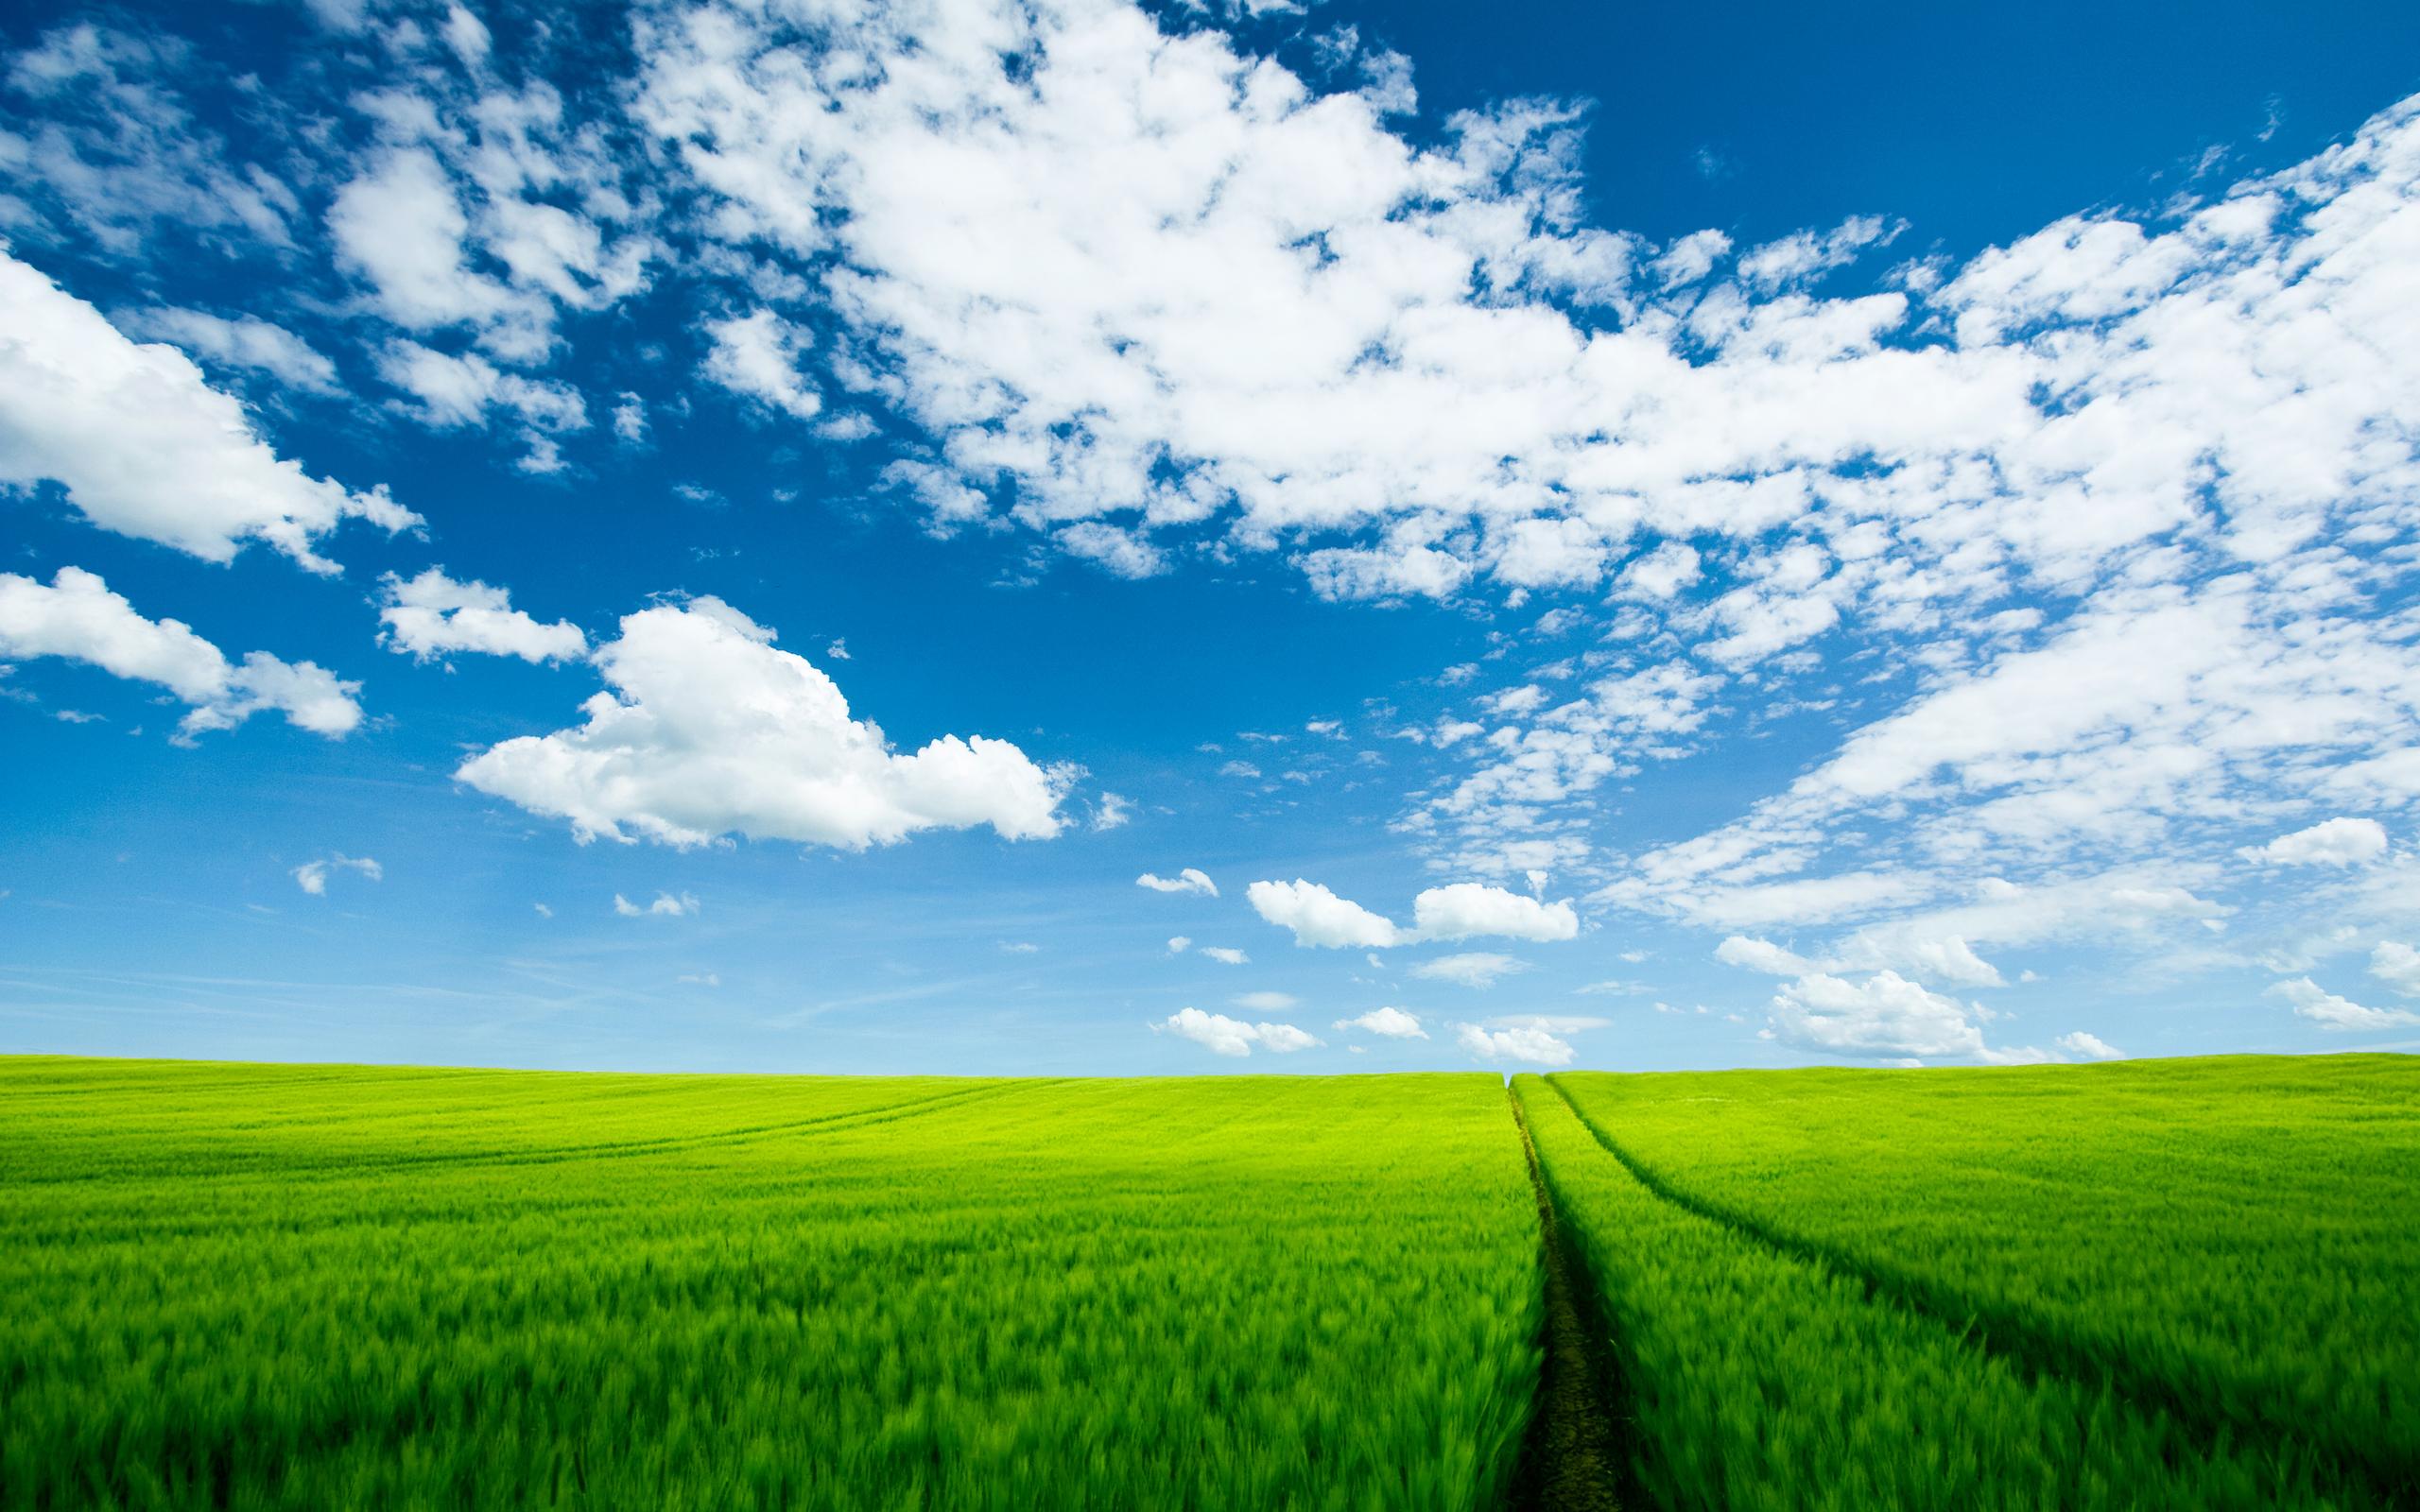 Summer Landscape Wallpapers HD Wallpapers 2560x1600